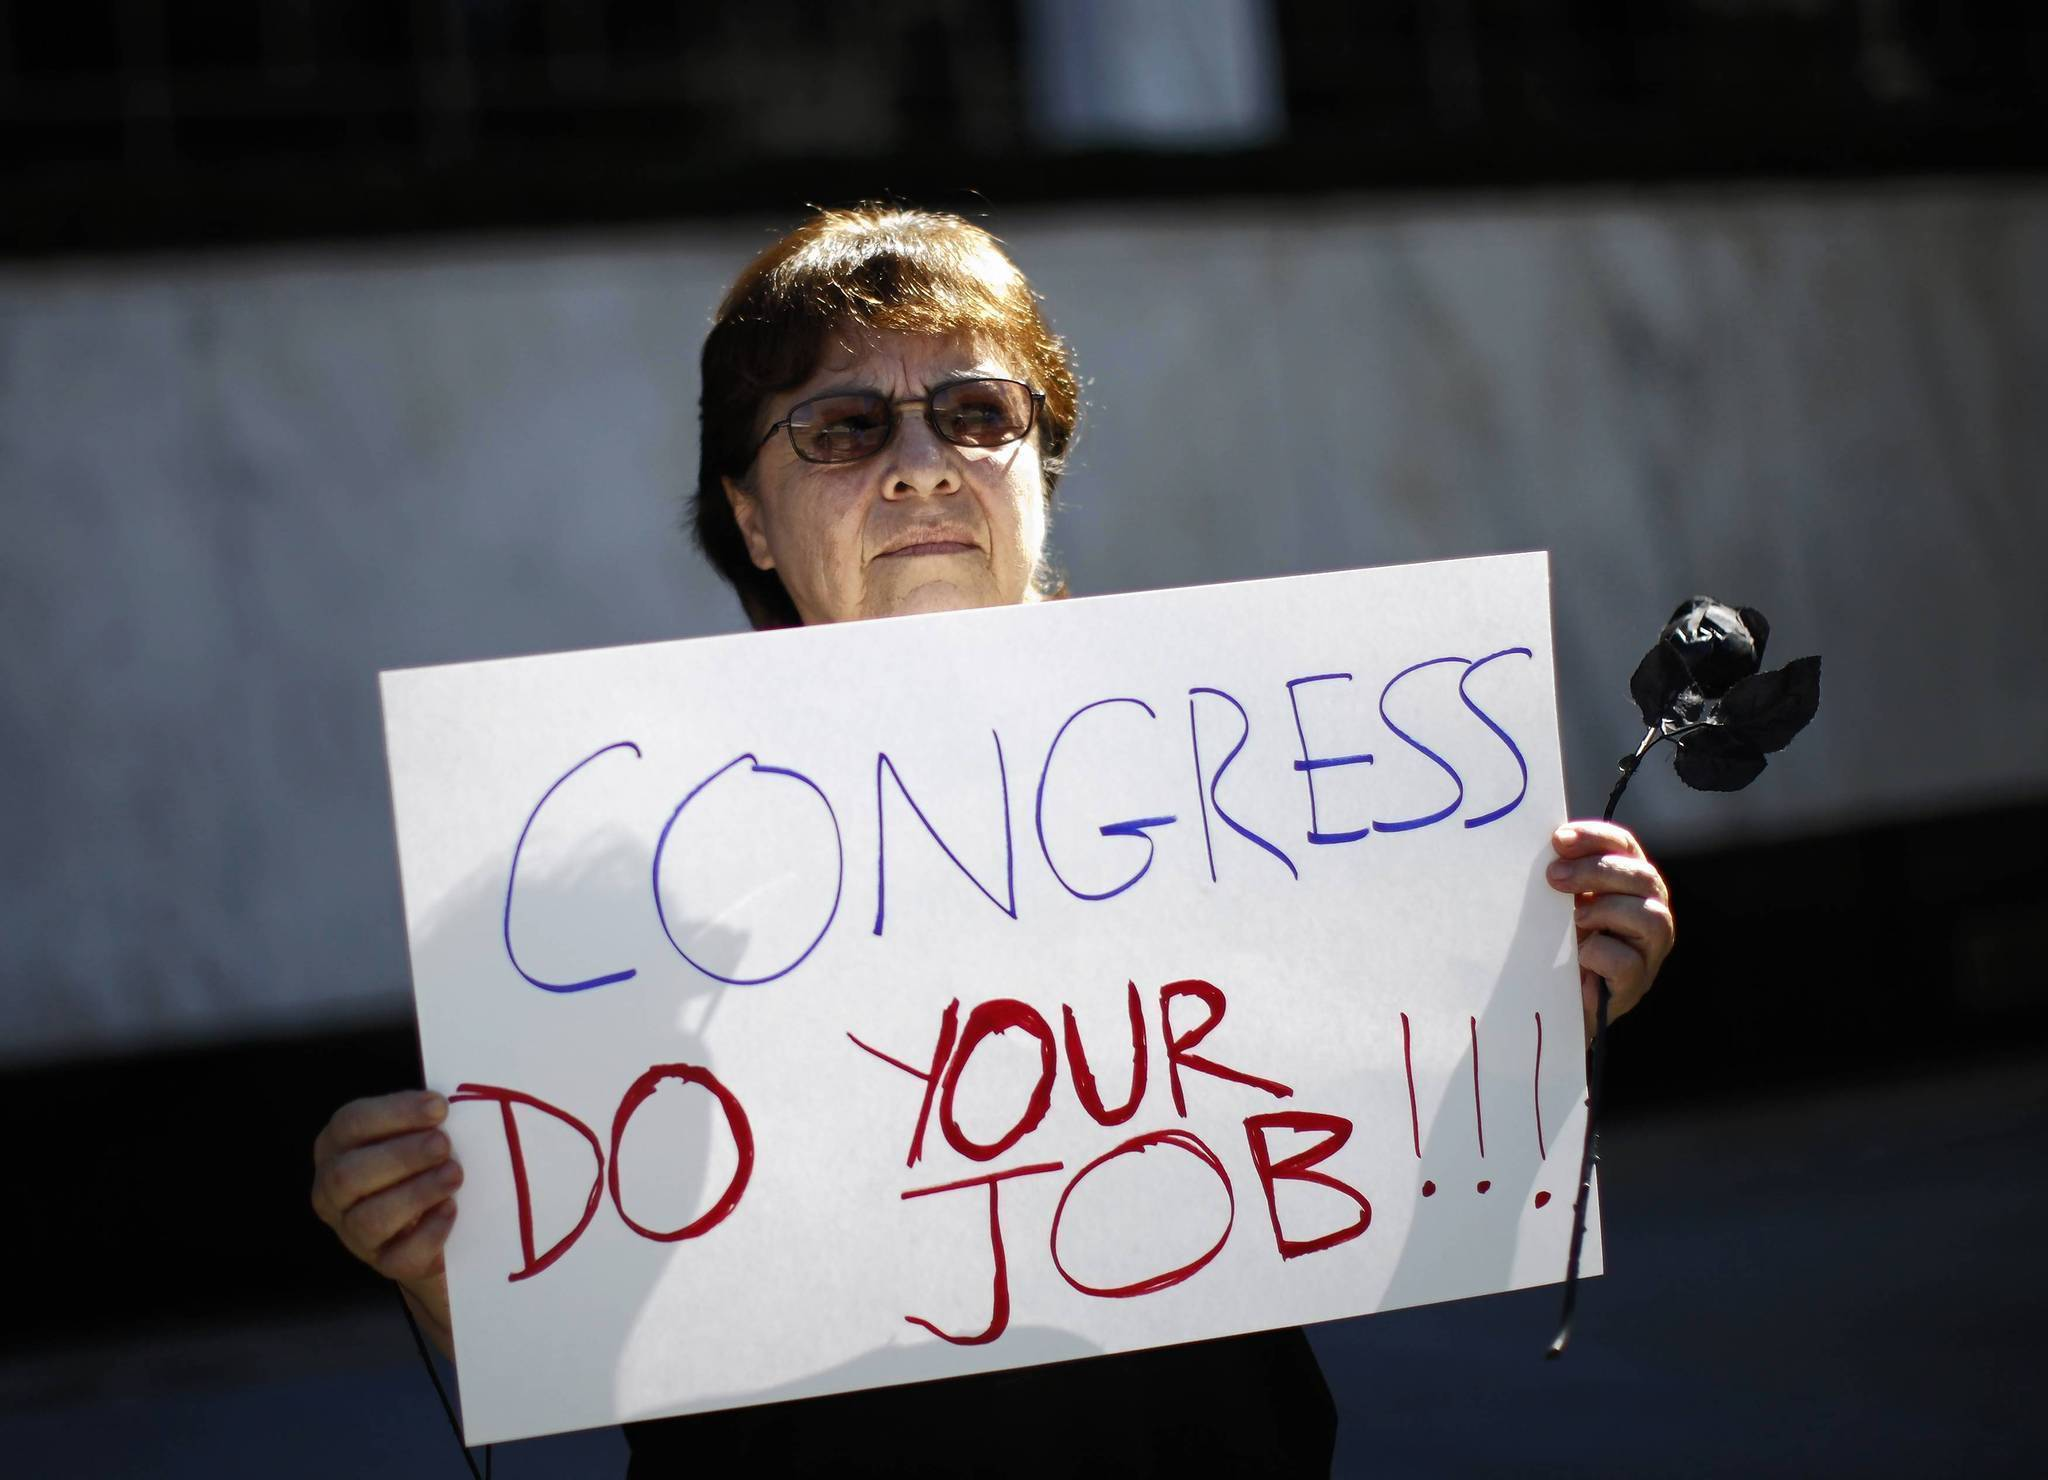 Obama says Washington has much work to do to regain public trust